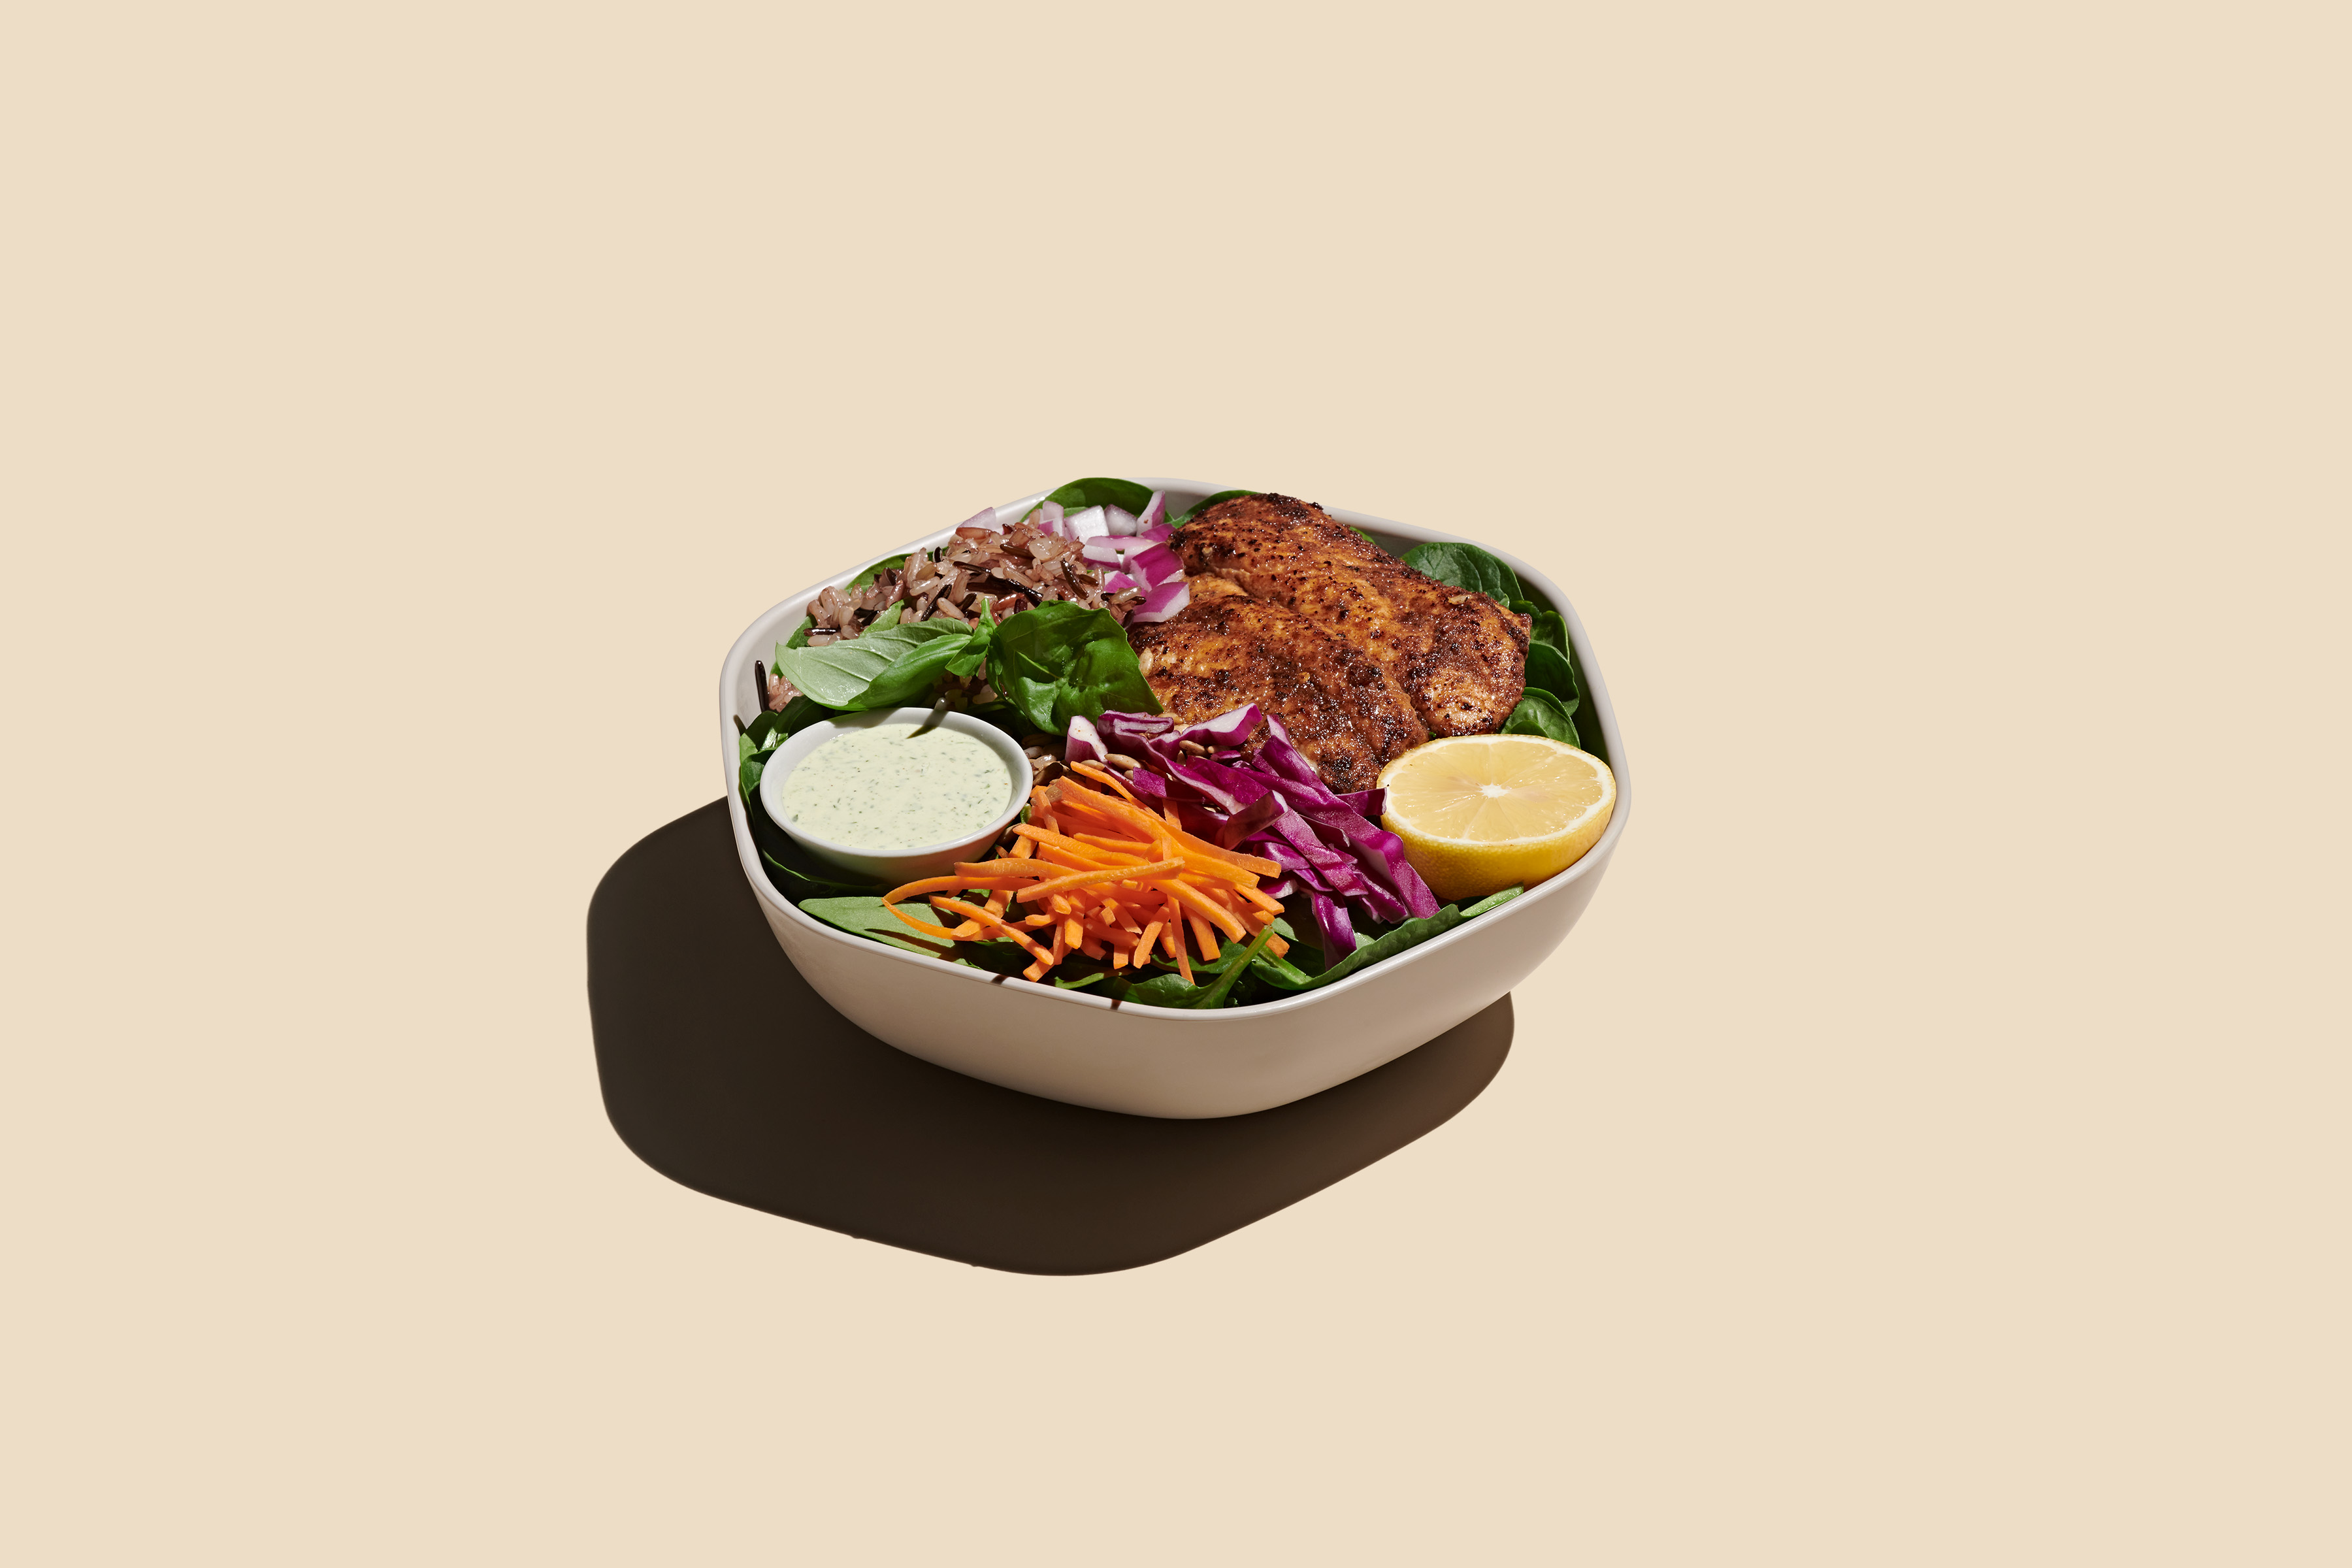 Blackened catfish bowl